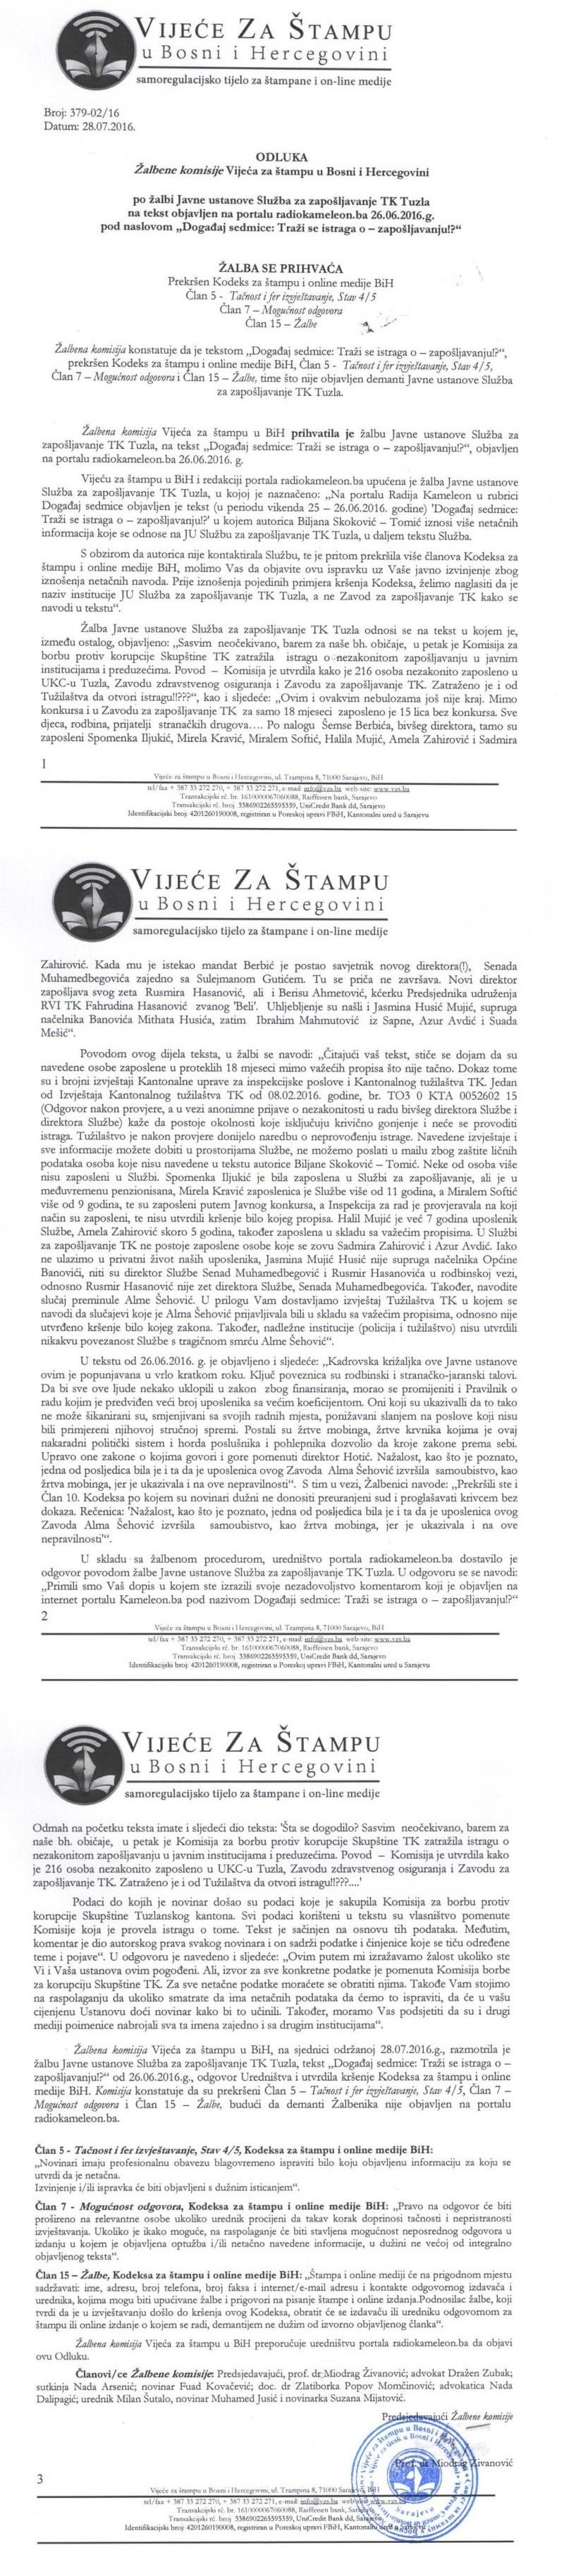 odluka-zk-vzsubih-szztk-radiokameleon-ba-page-001